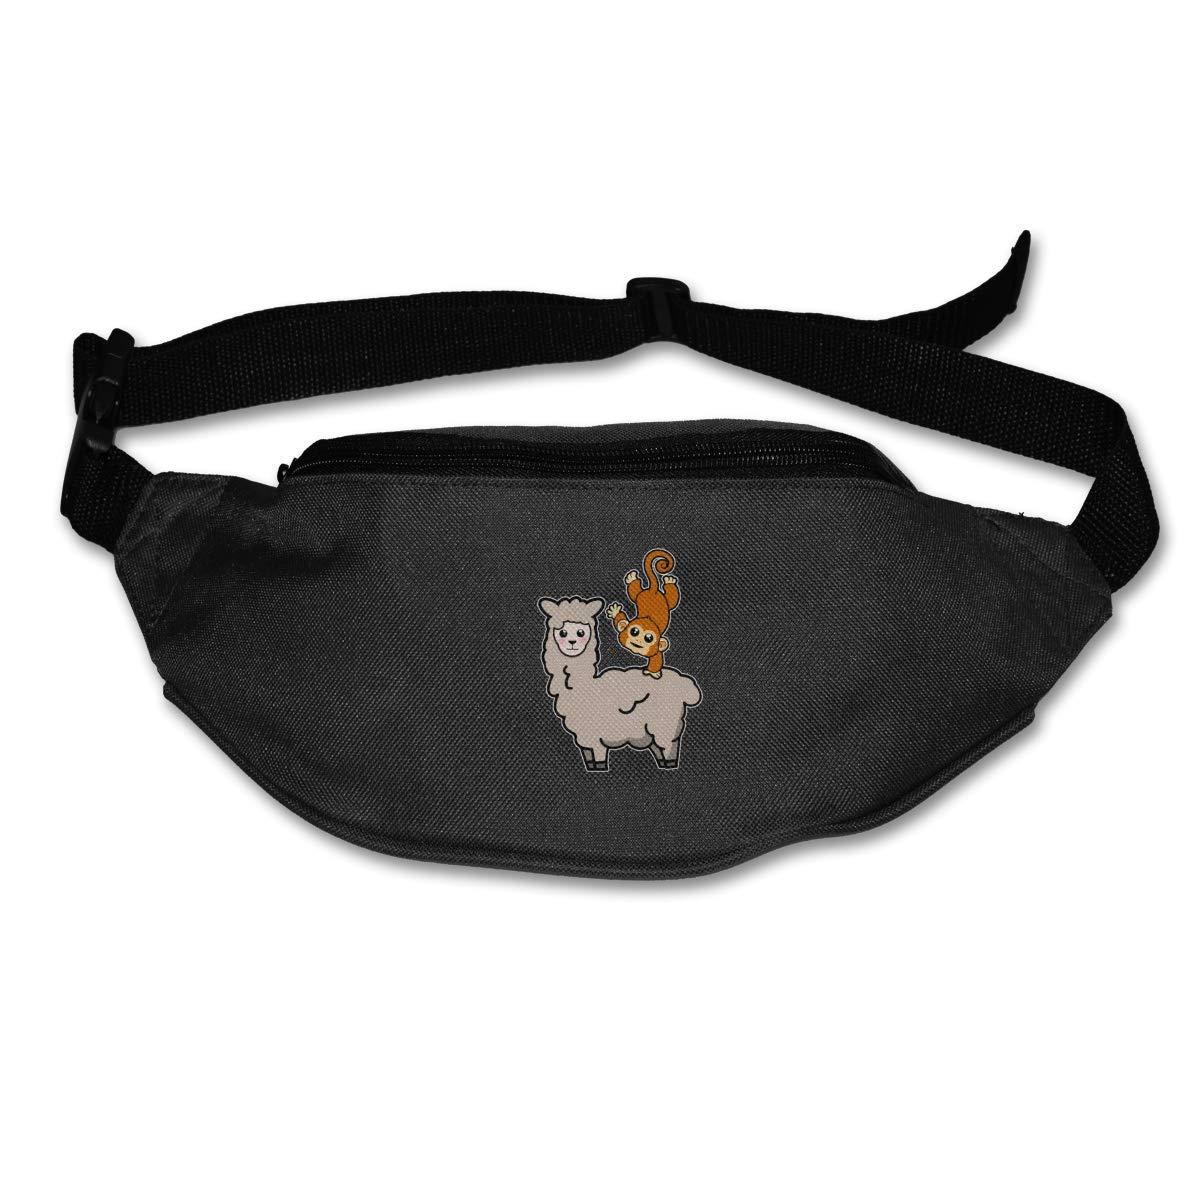 Monkey Riding On Llama Sport Waist Bag Fanny Pack Adjustable For Hike